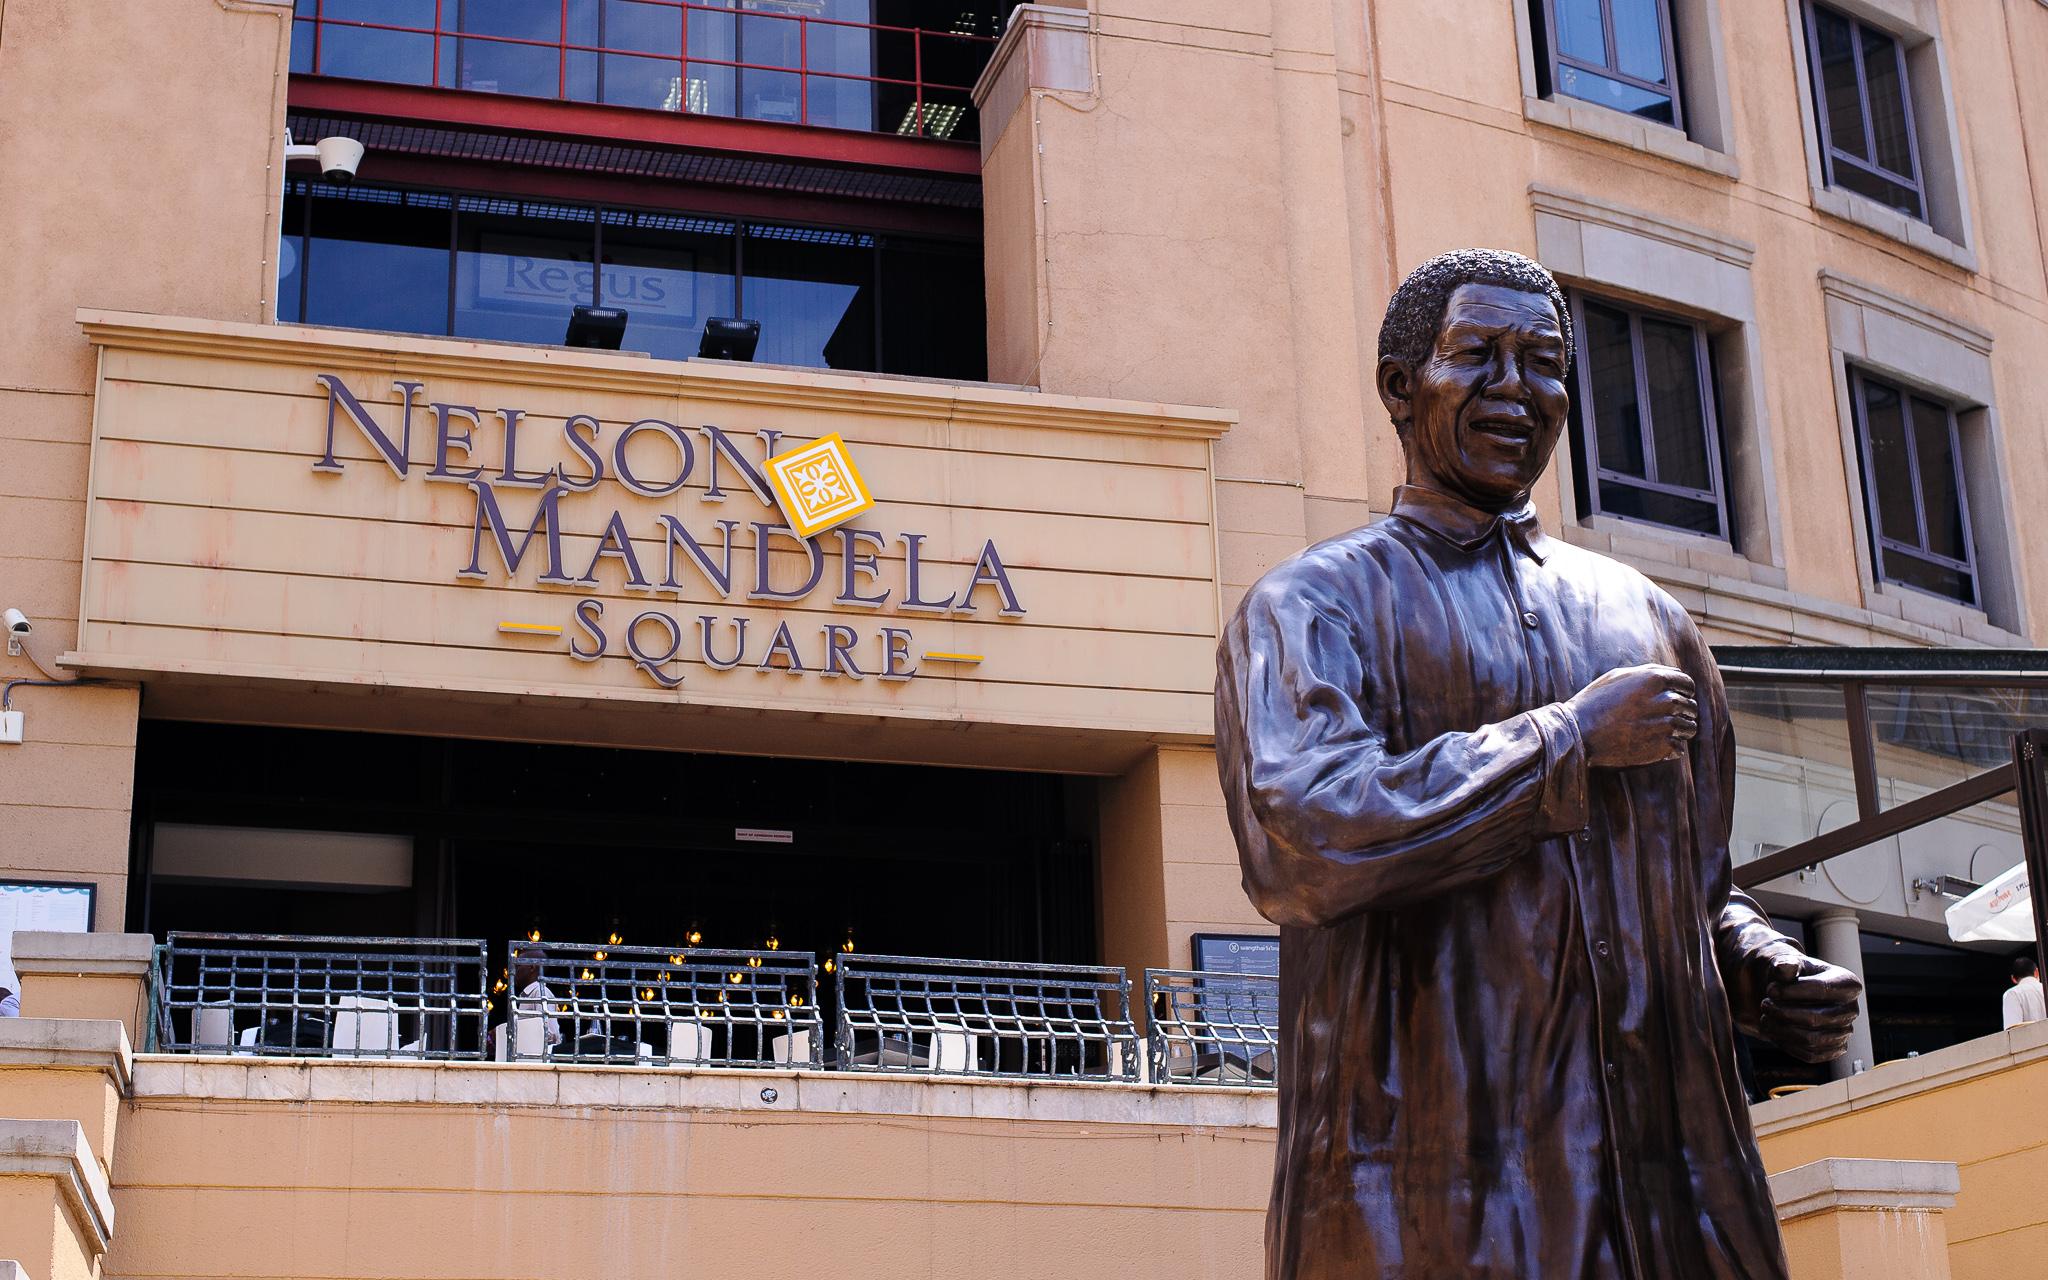 Nelson Mandela Square - Statue